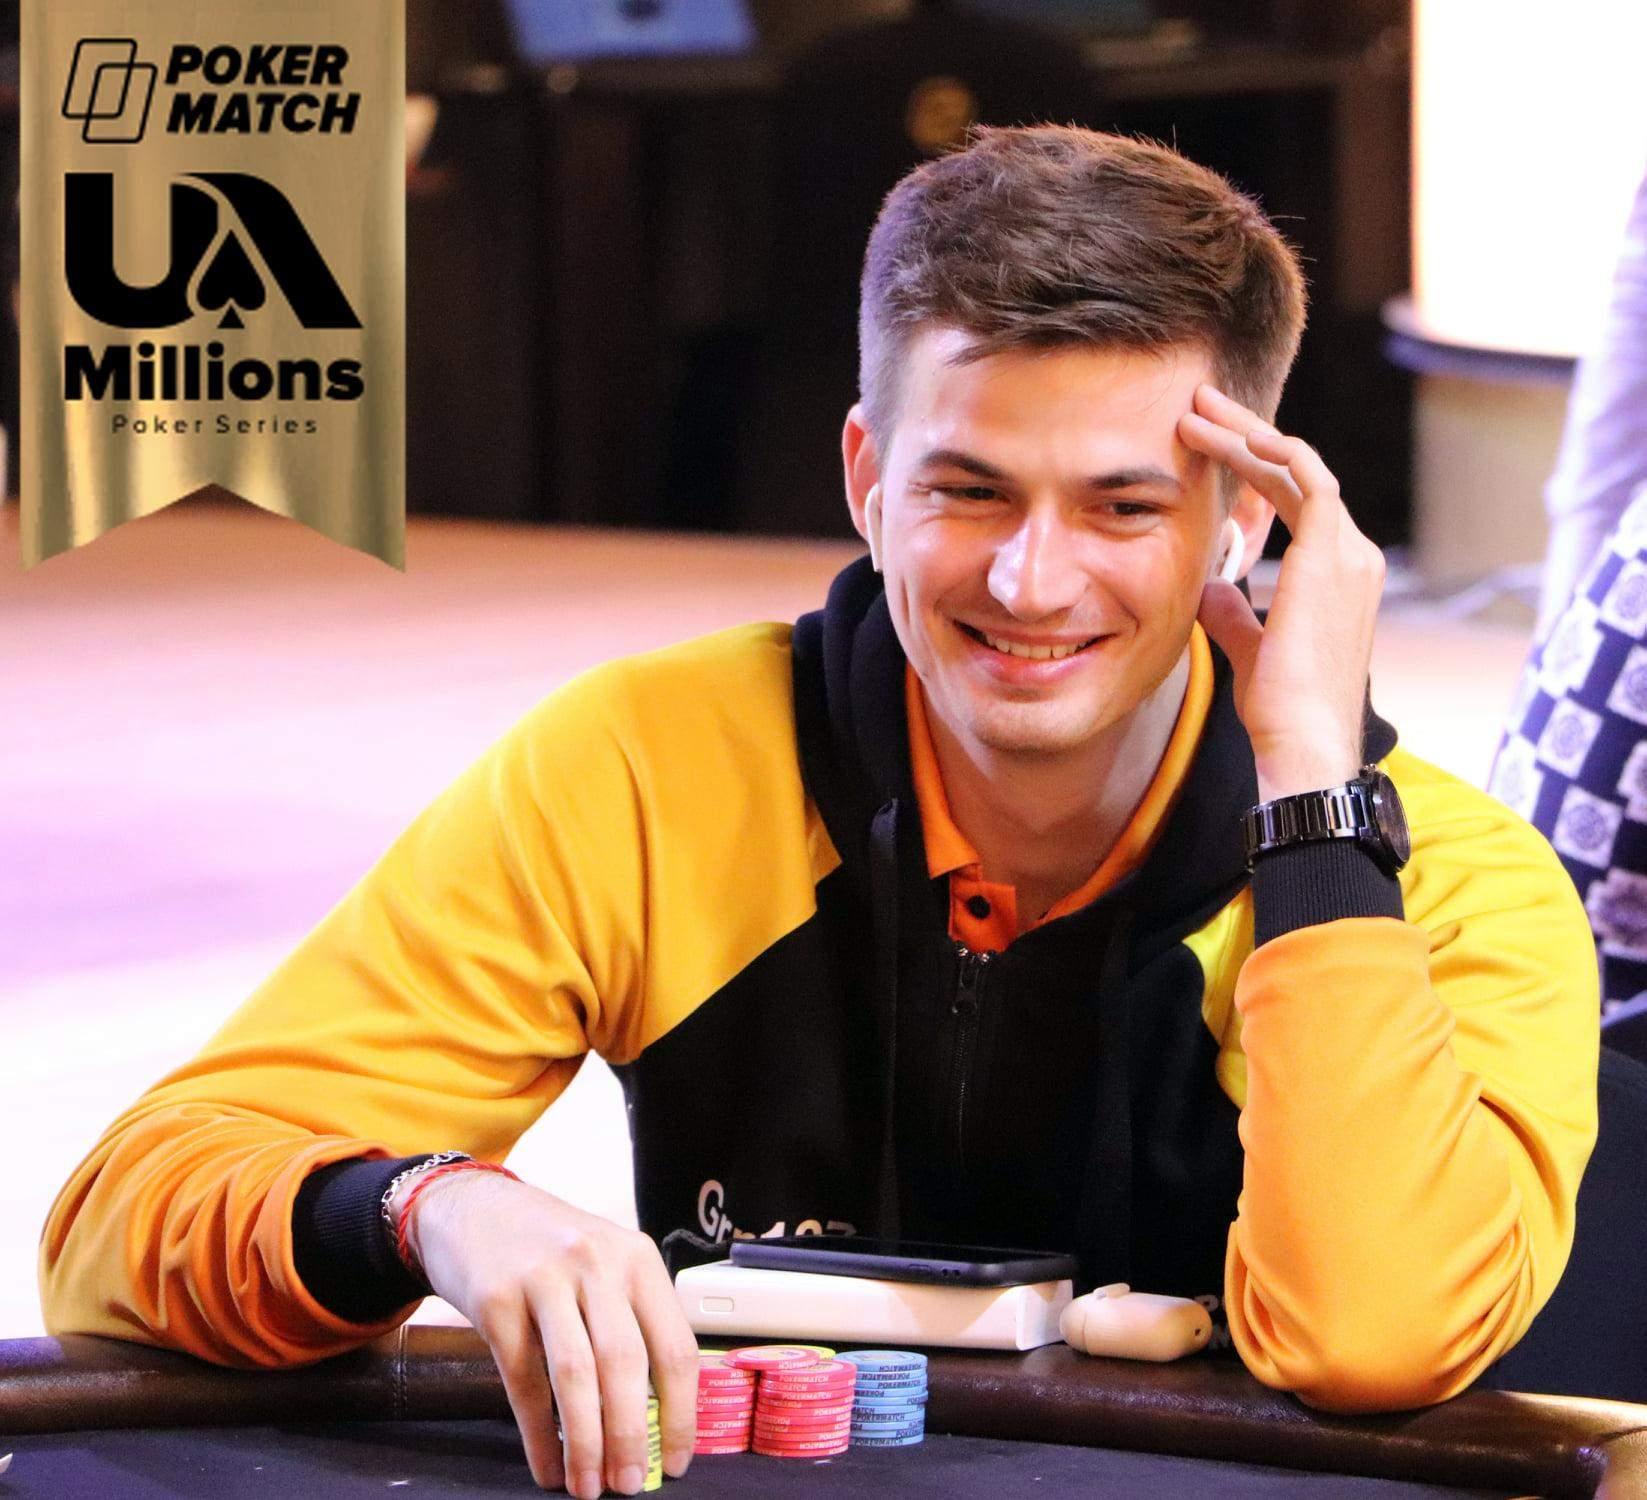 Стрімер Poker Match Рустам Гаврилюк